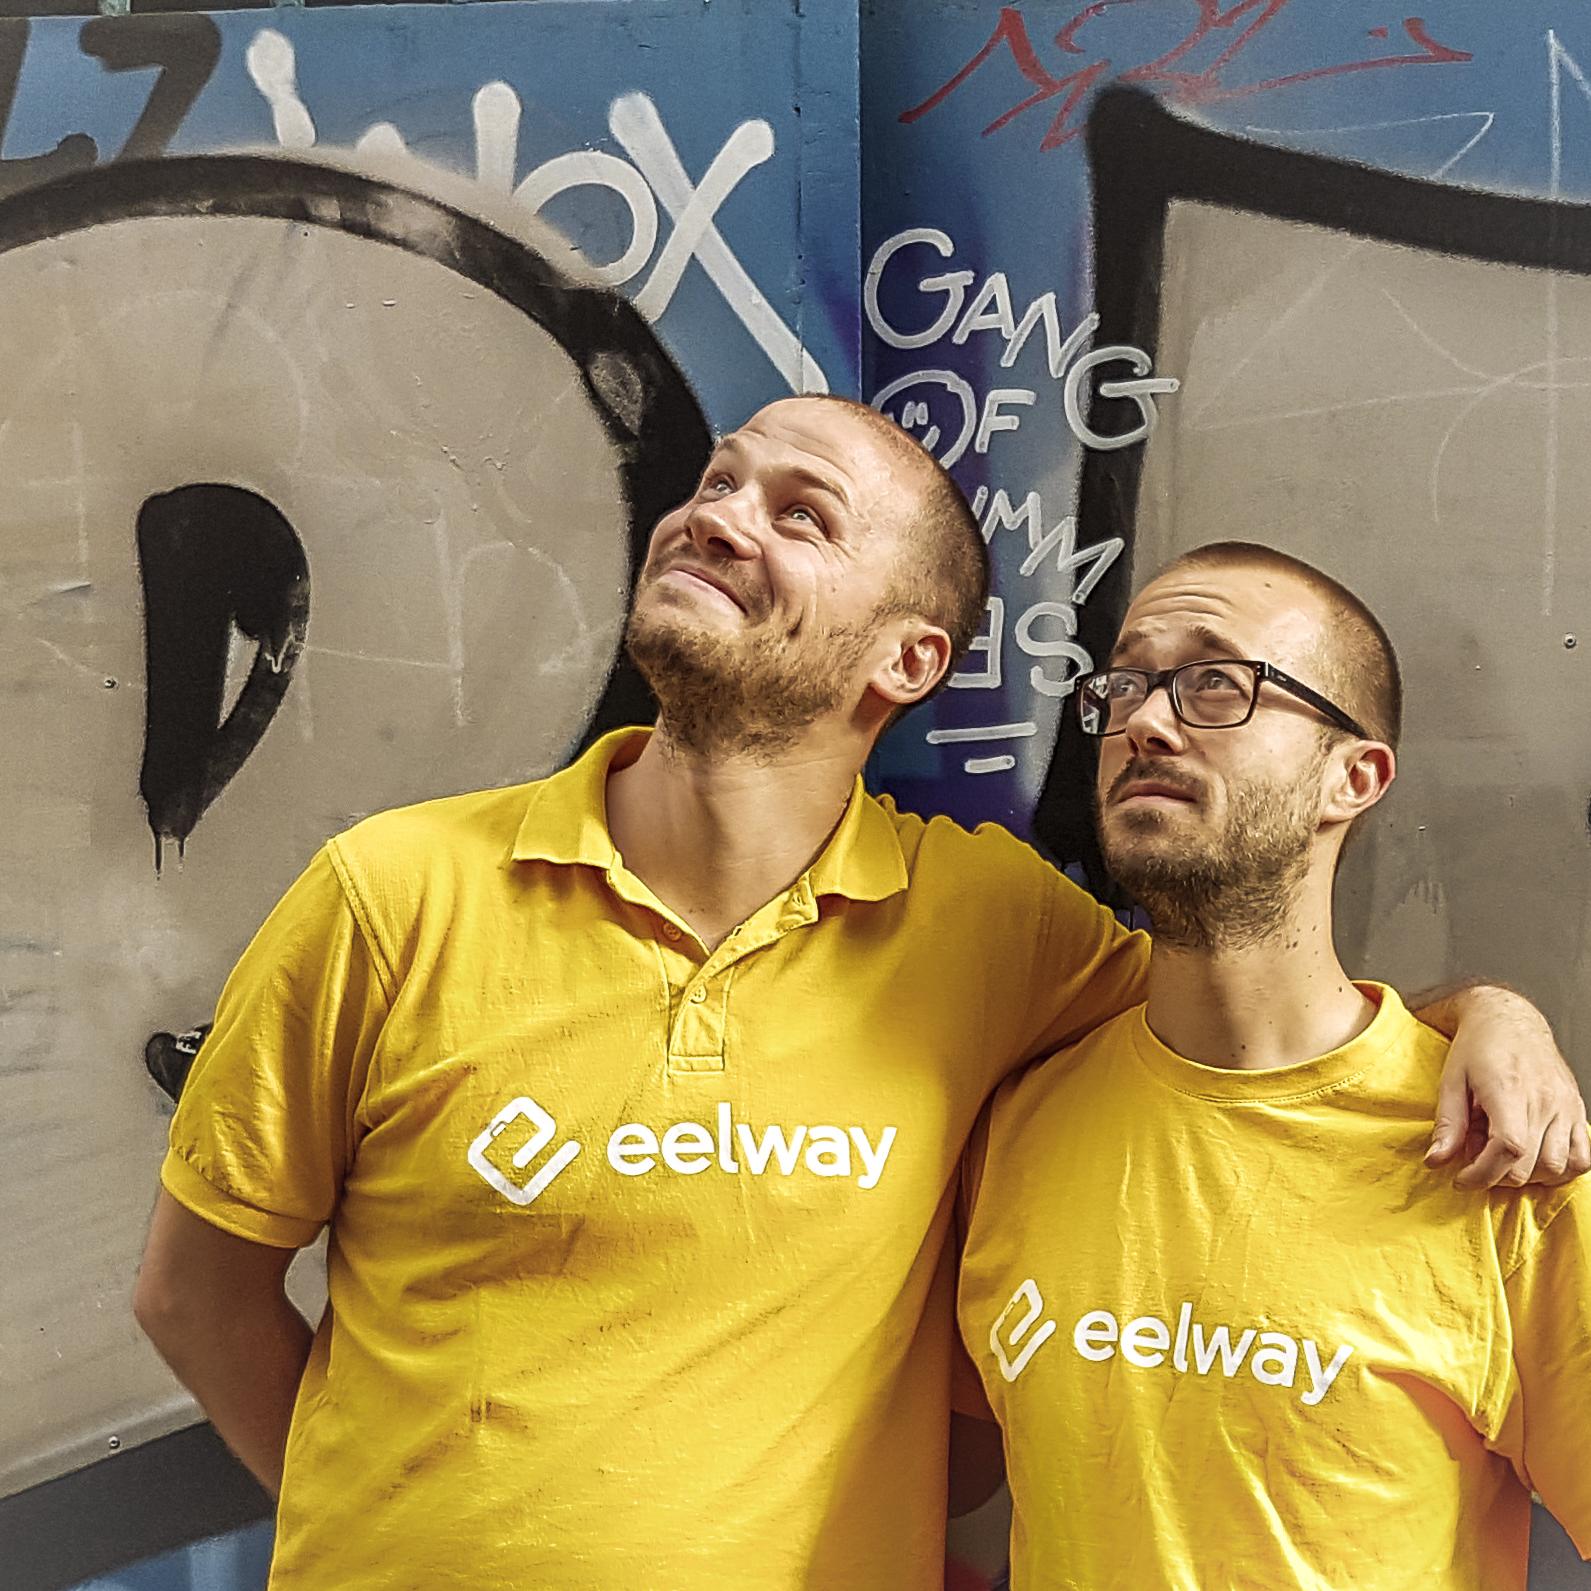 Les fondateurs de Eelway